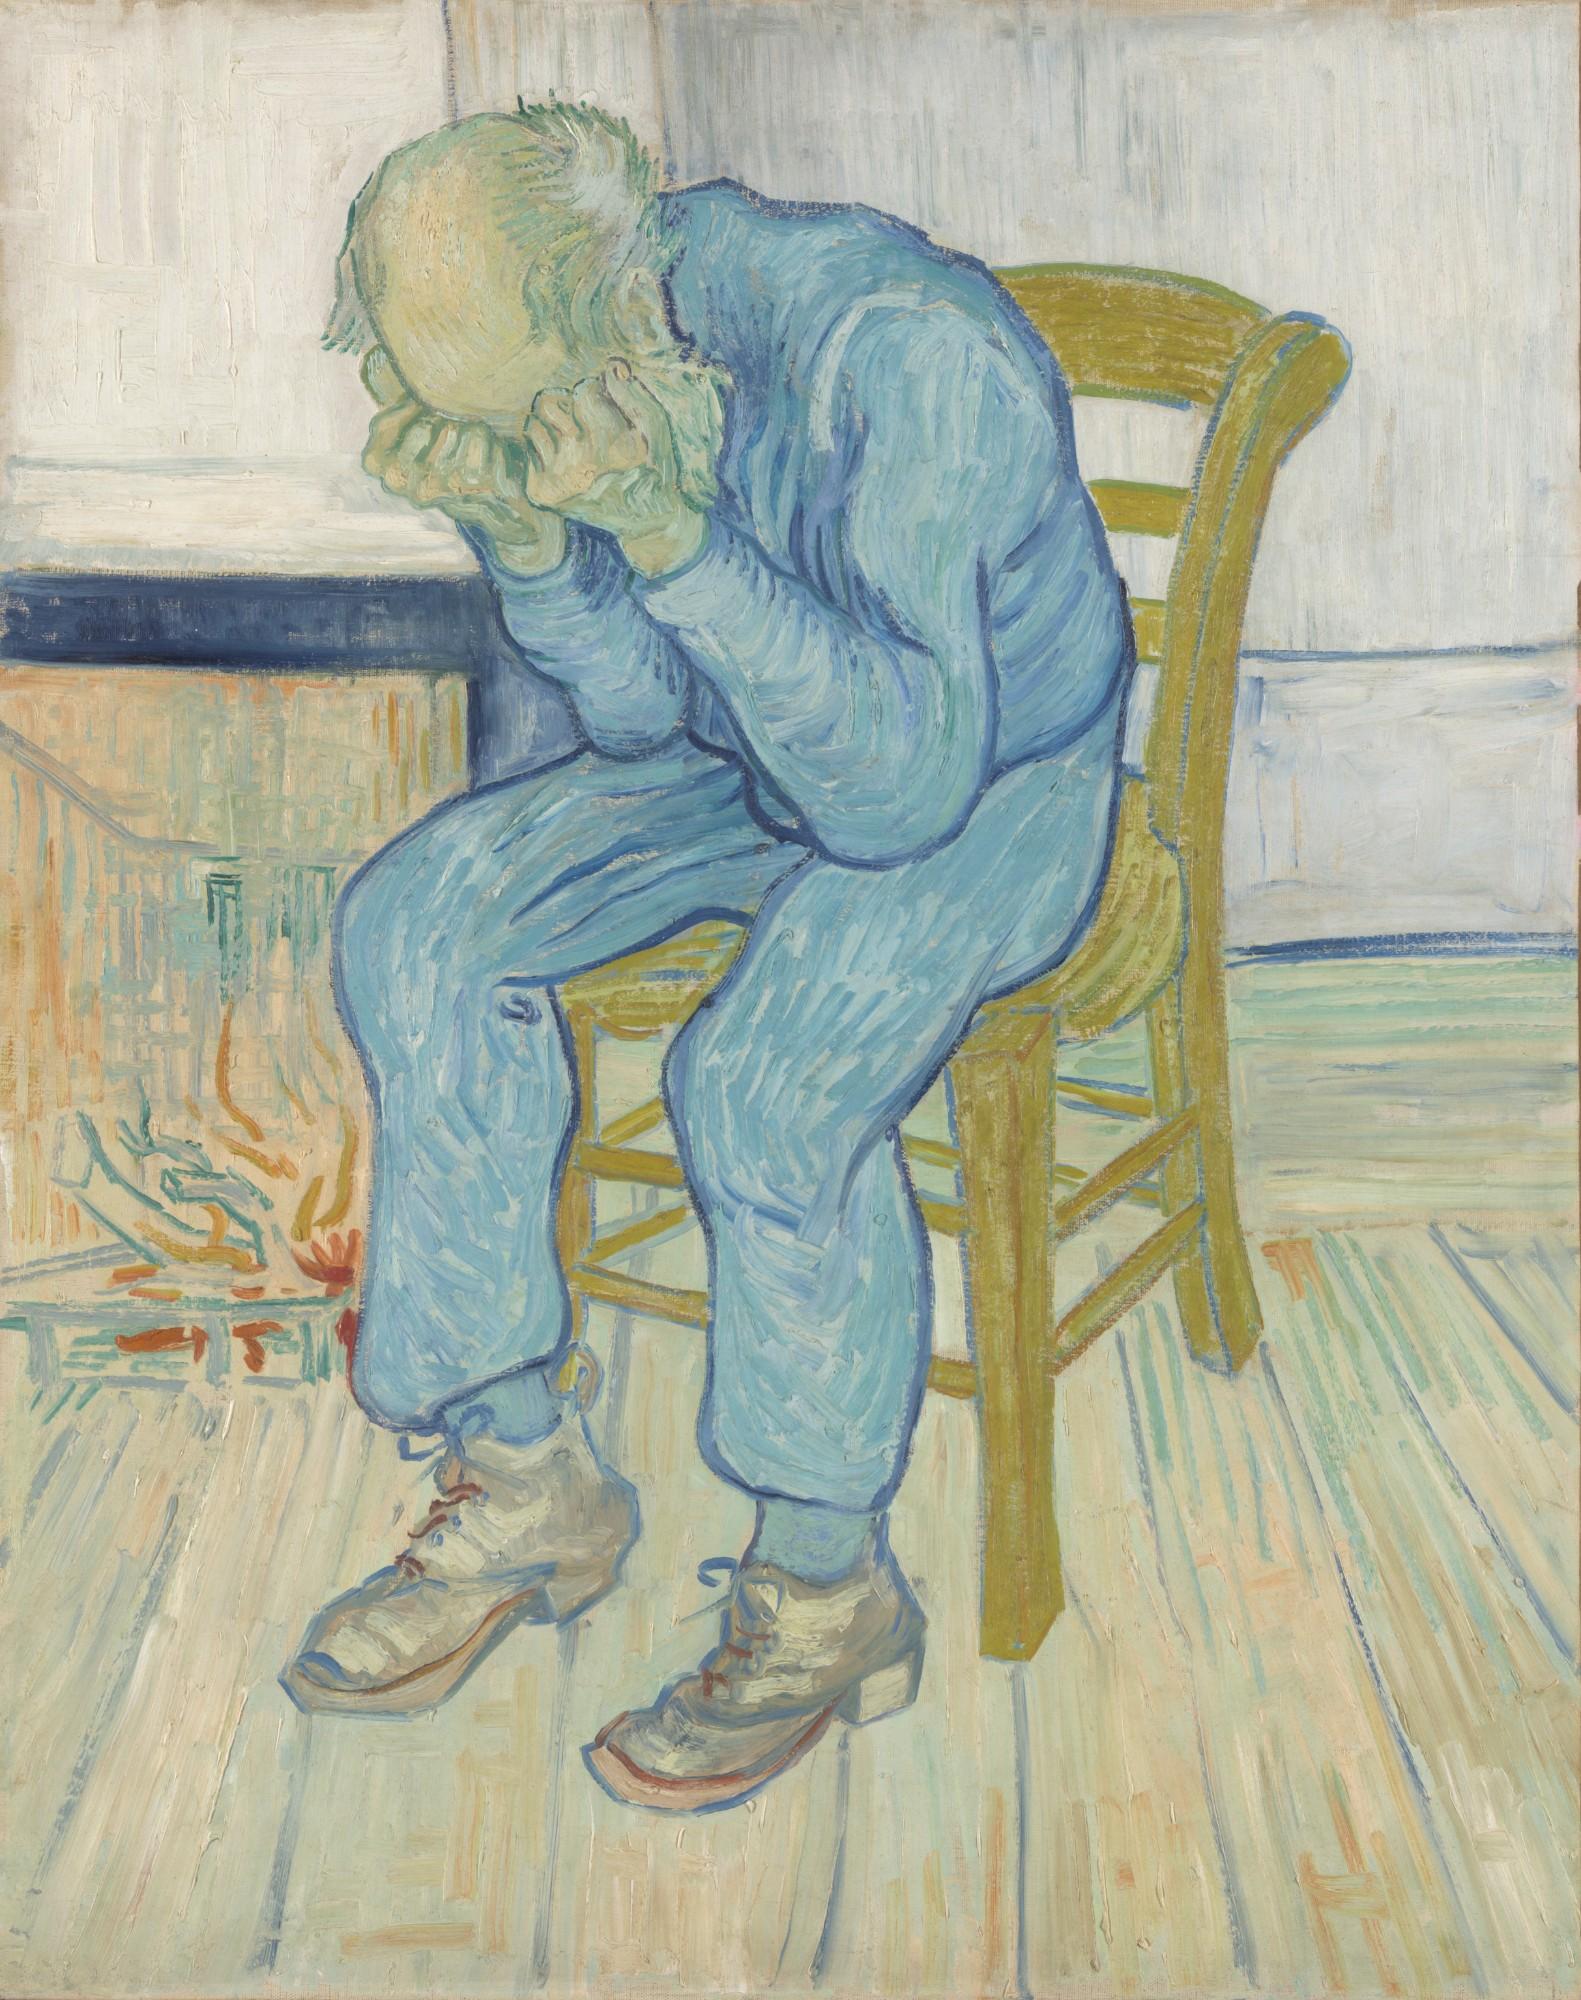 Vincent van Gogh – At Eternity's Gate, 1890. Collection Kröller-Müller Museum, Otterlo